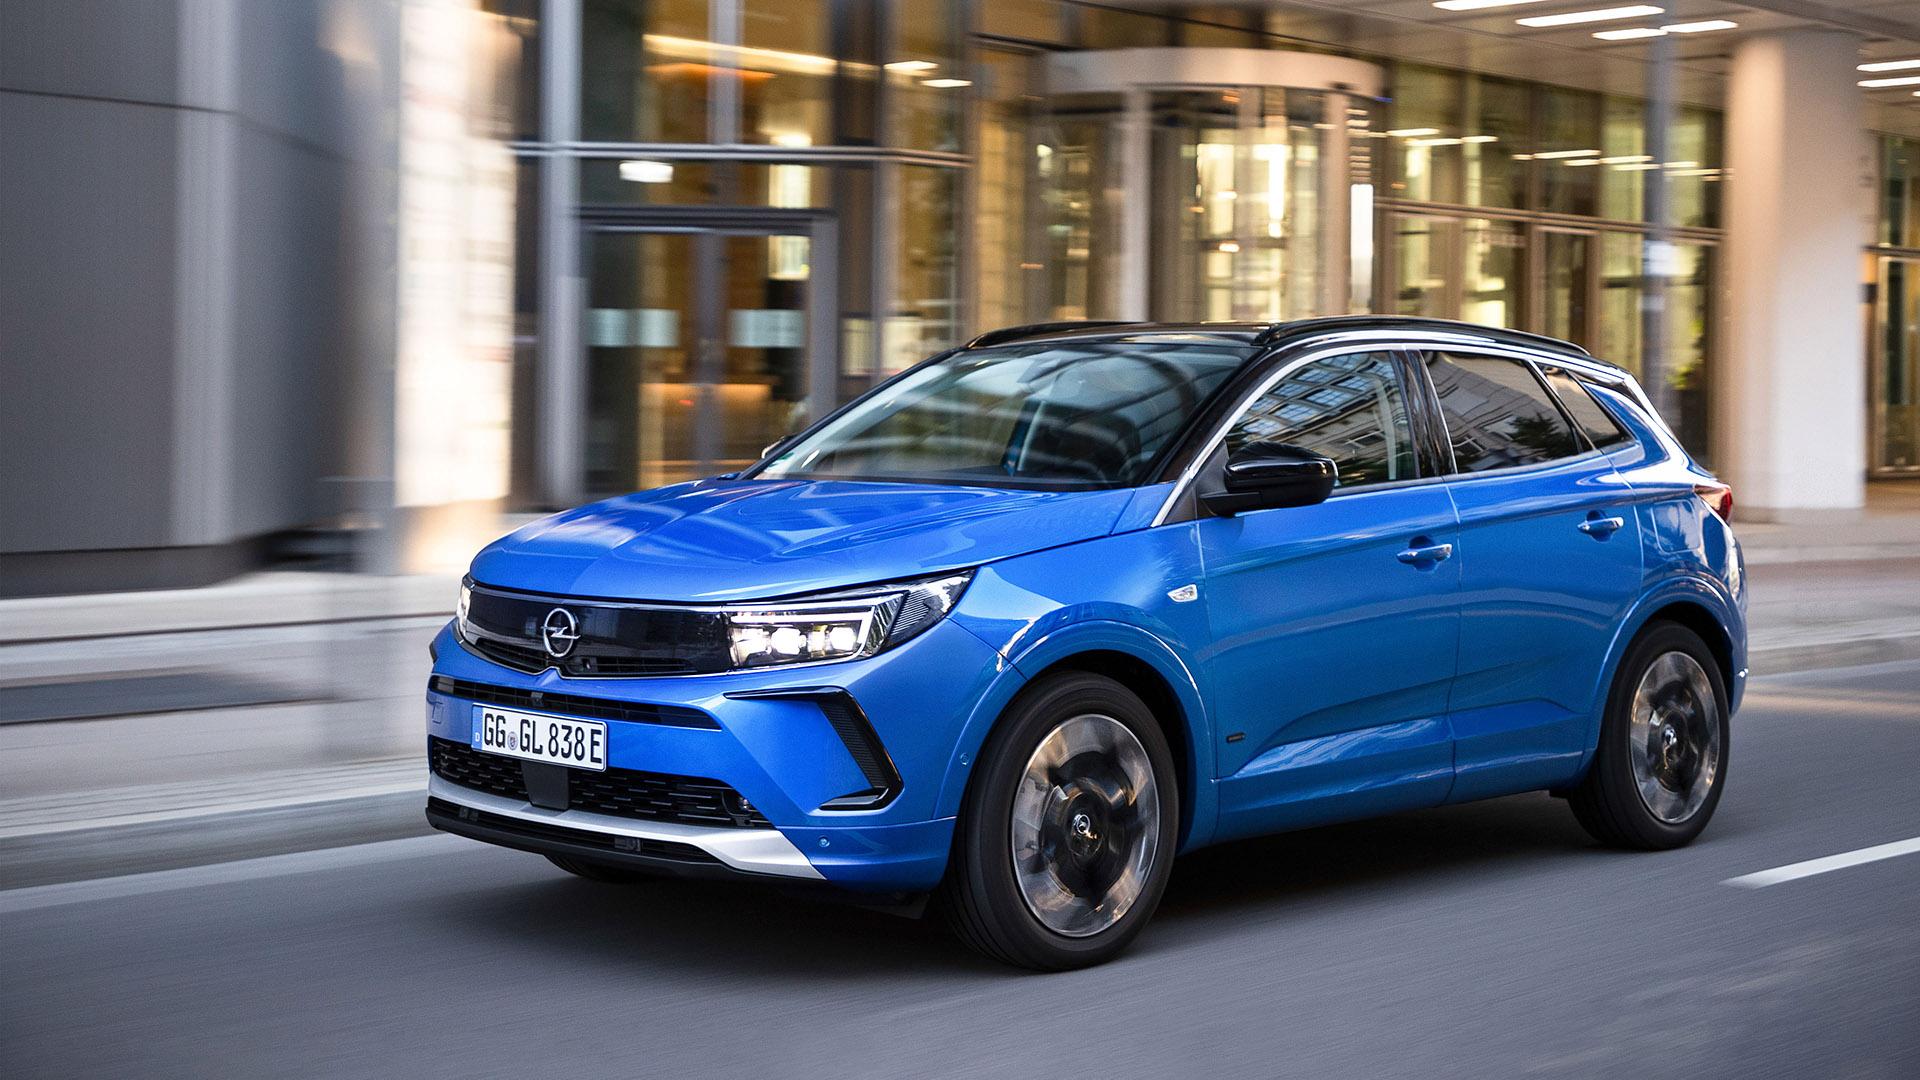 Opel: Δοκιμάζουμε το ανανεωμένο Grandland (pics)